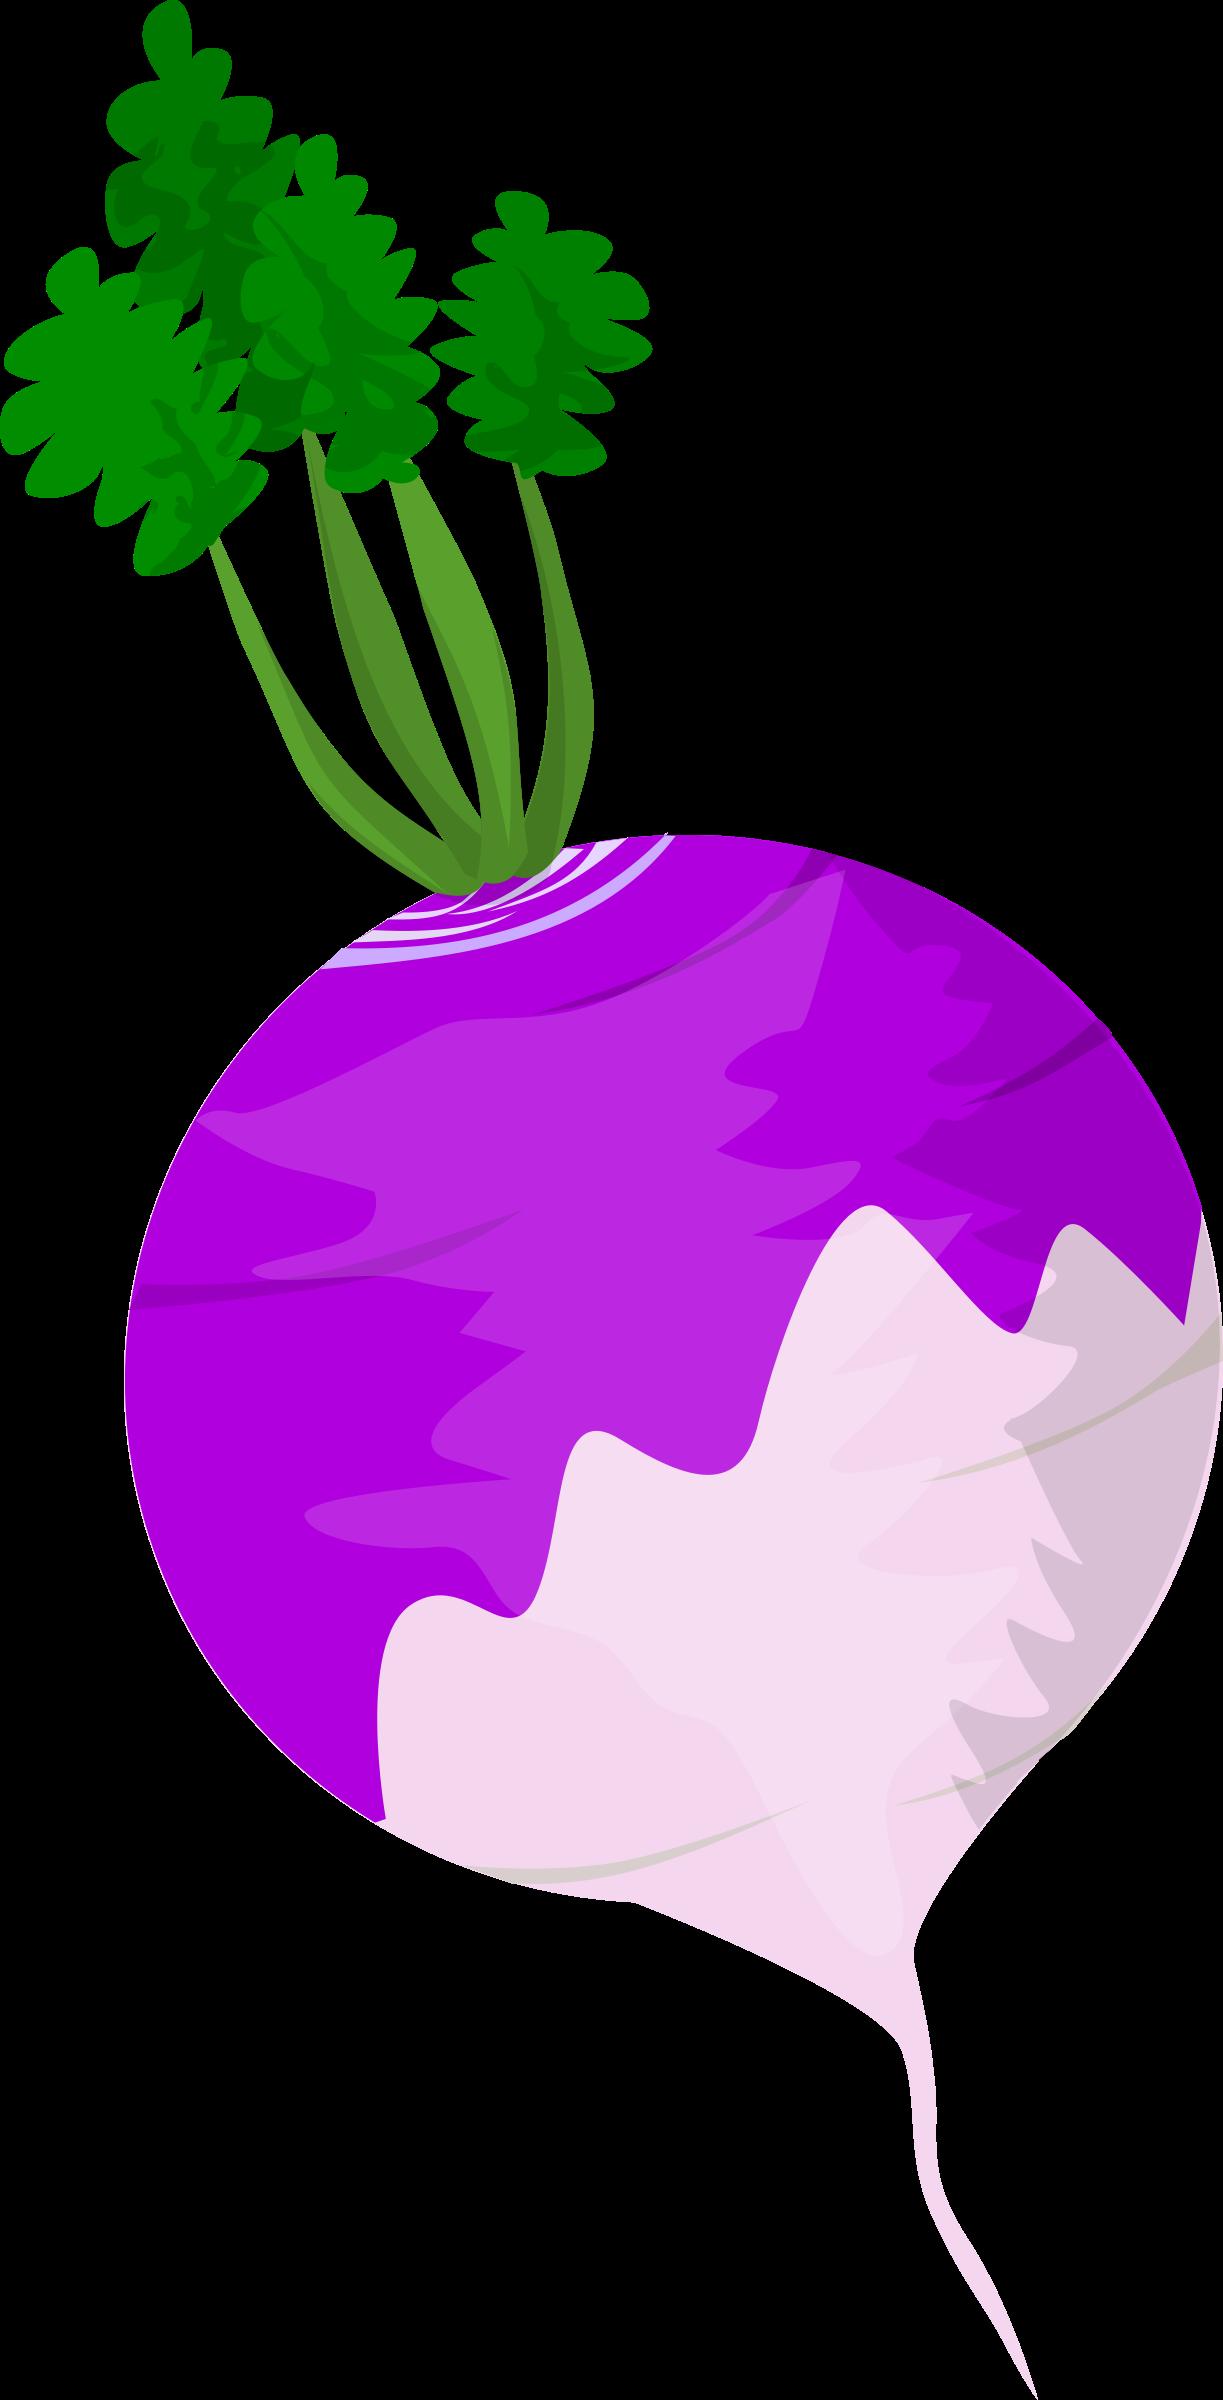 Vegetables clipart turnip. Big image png